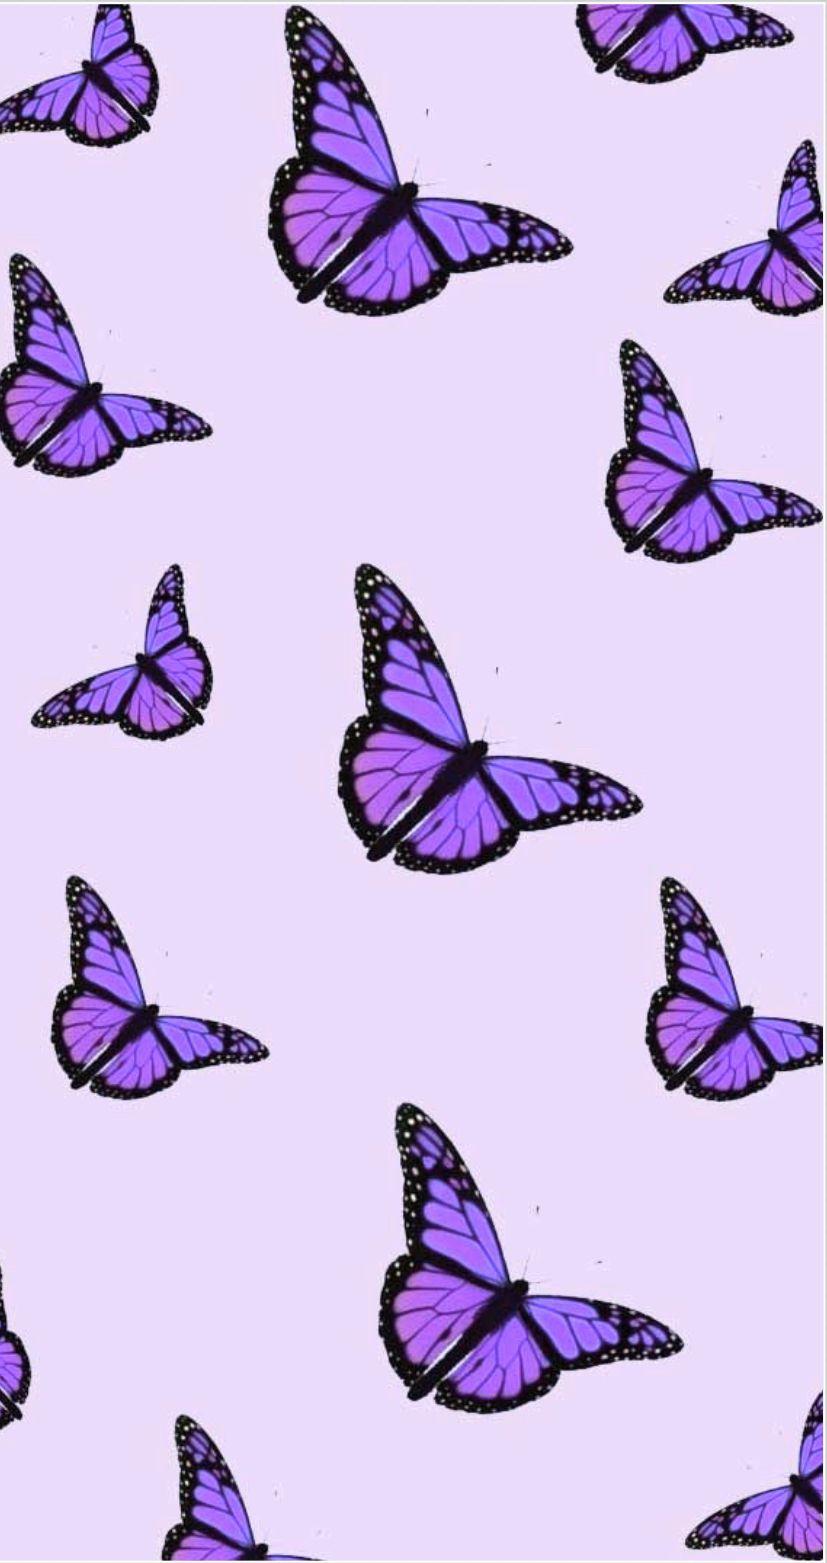 Best of Aesthetic Butterfly Wallpaper Vsco - wallpaperhome